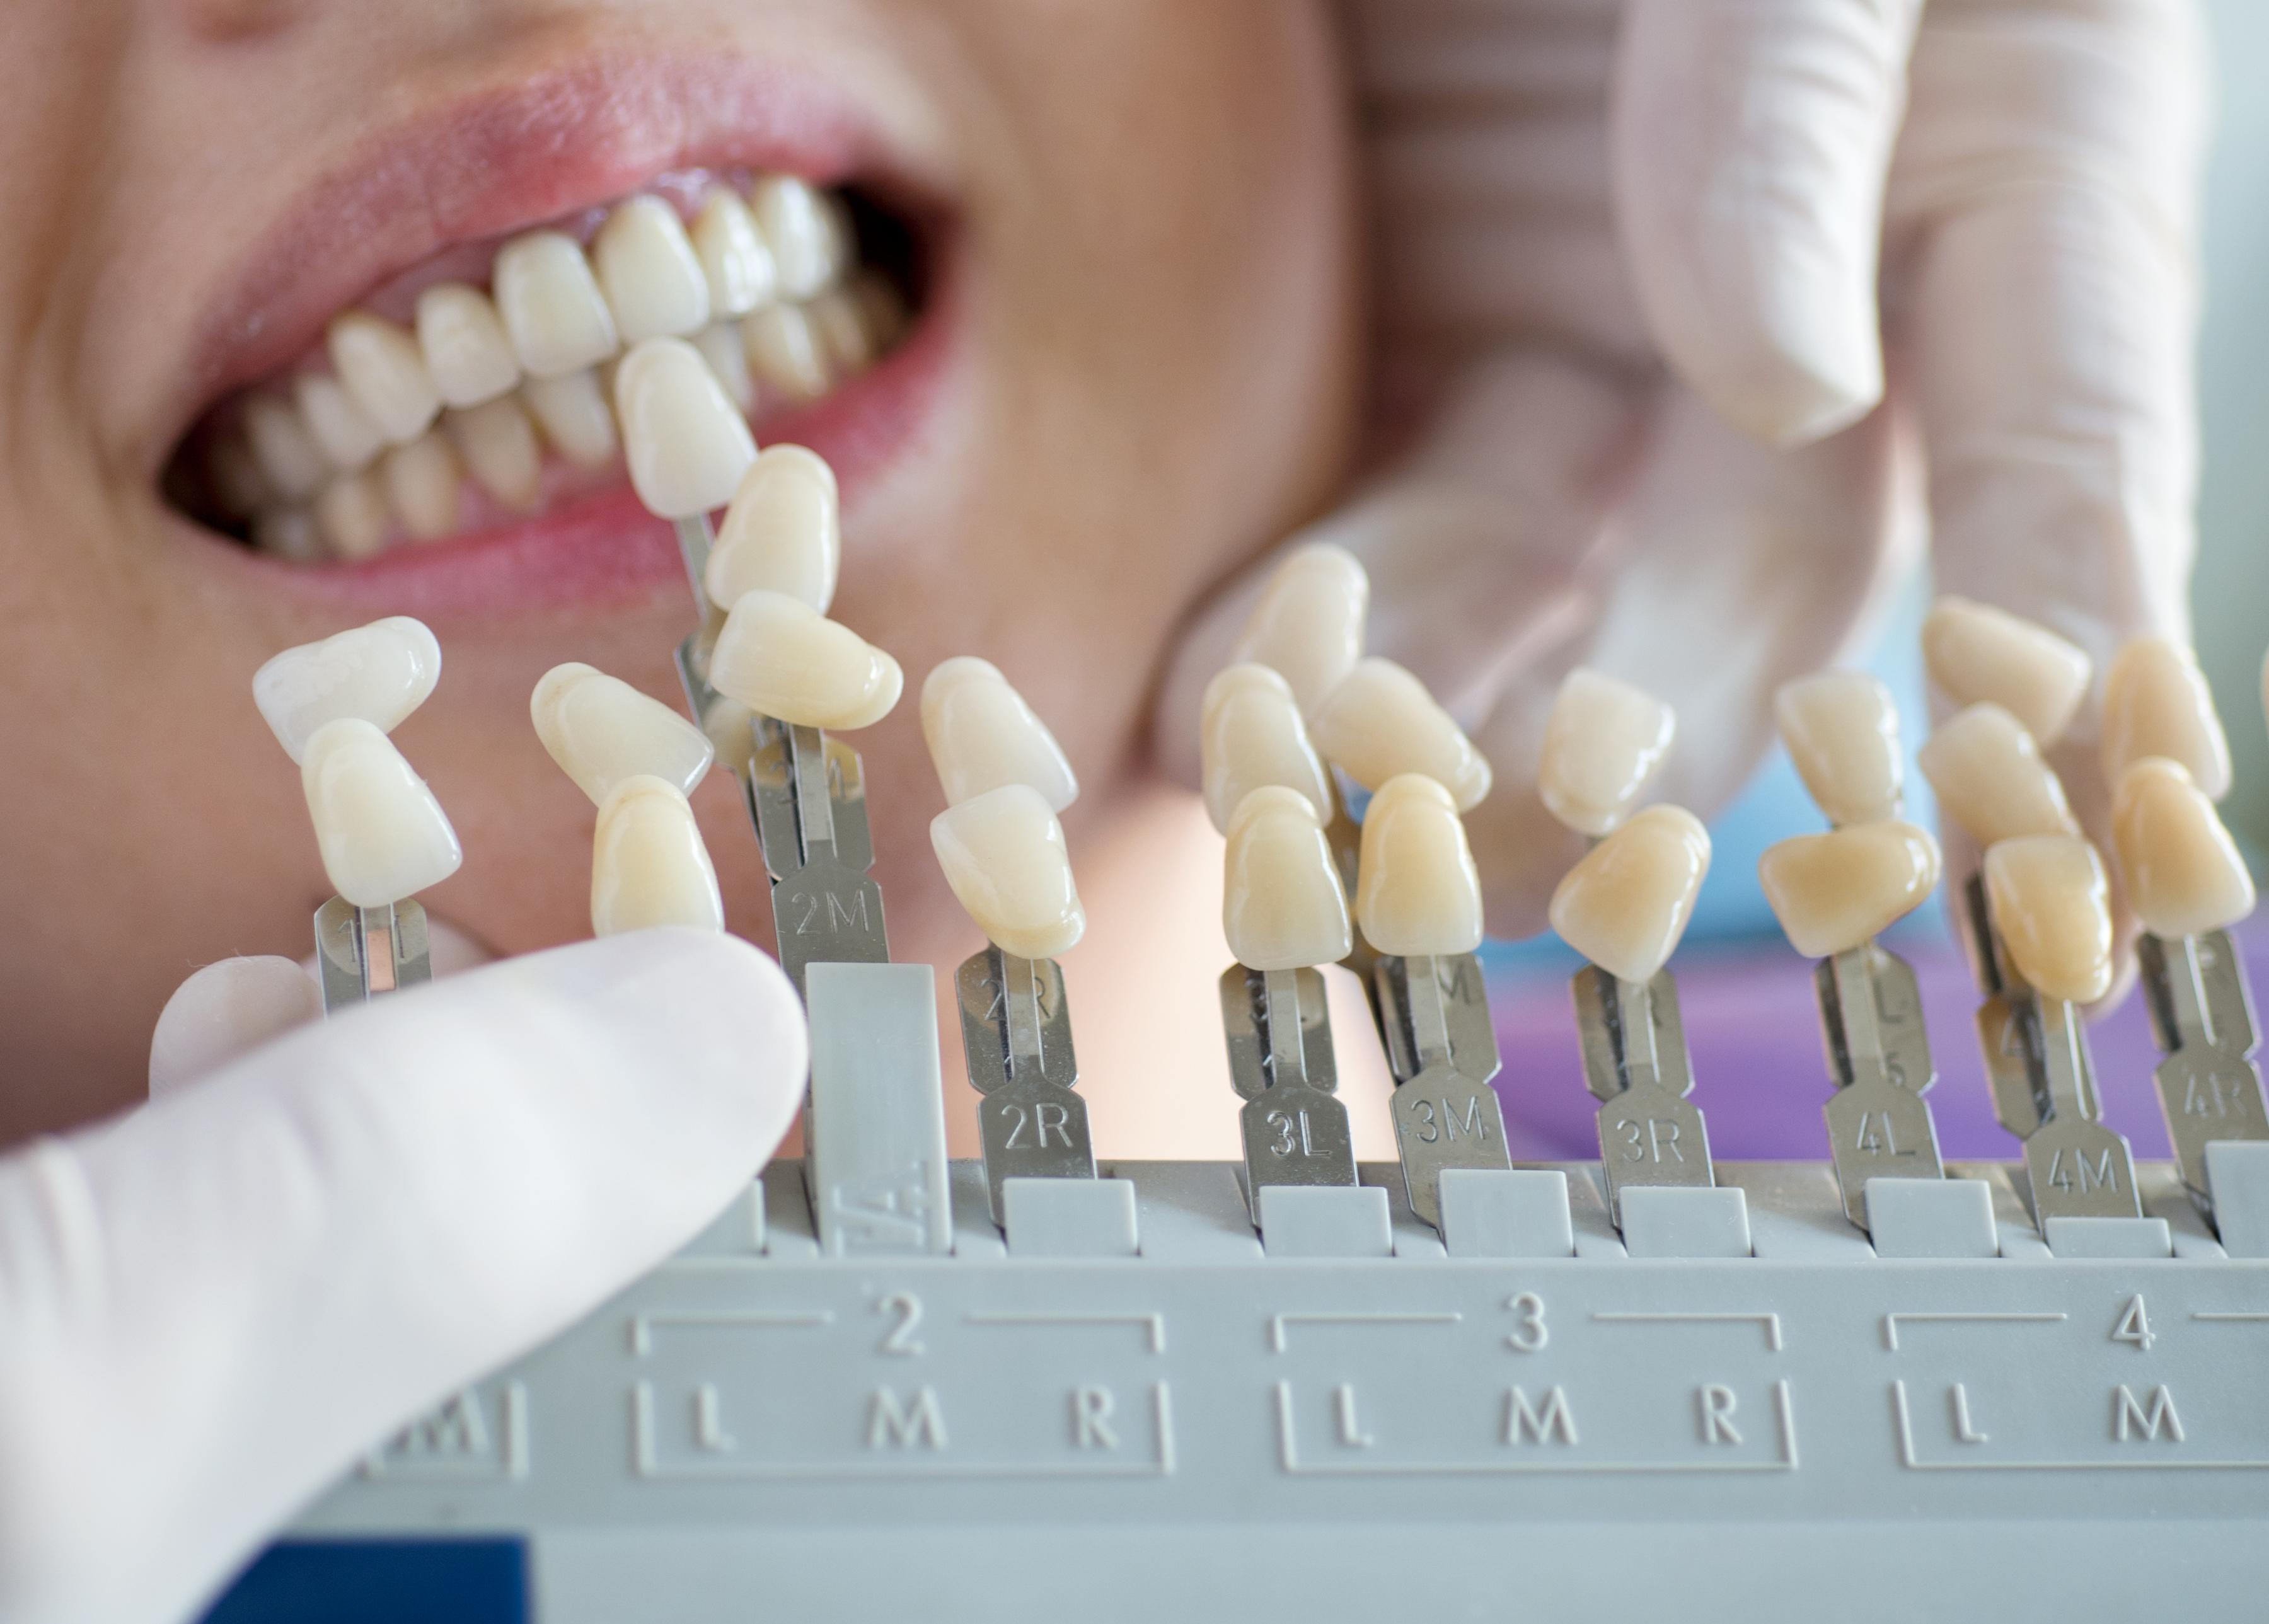 Cl nica dental tirma l pez dentistas las palmas - Dentistas en las palmas ...